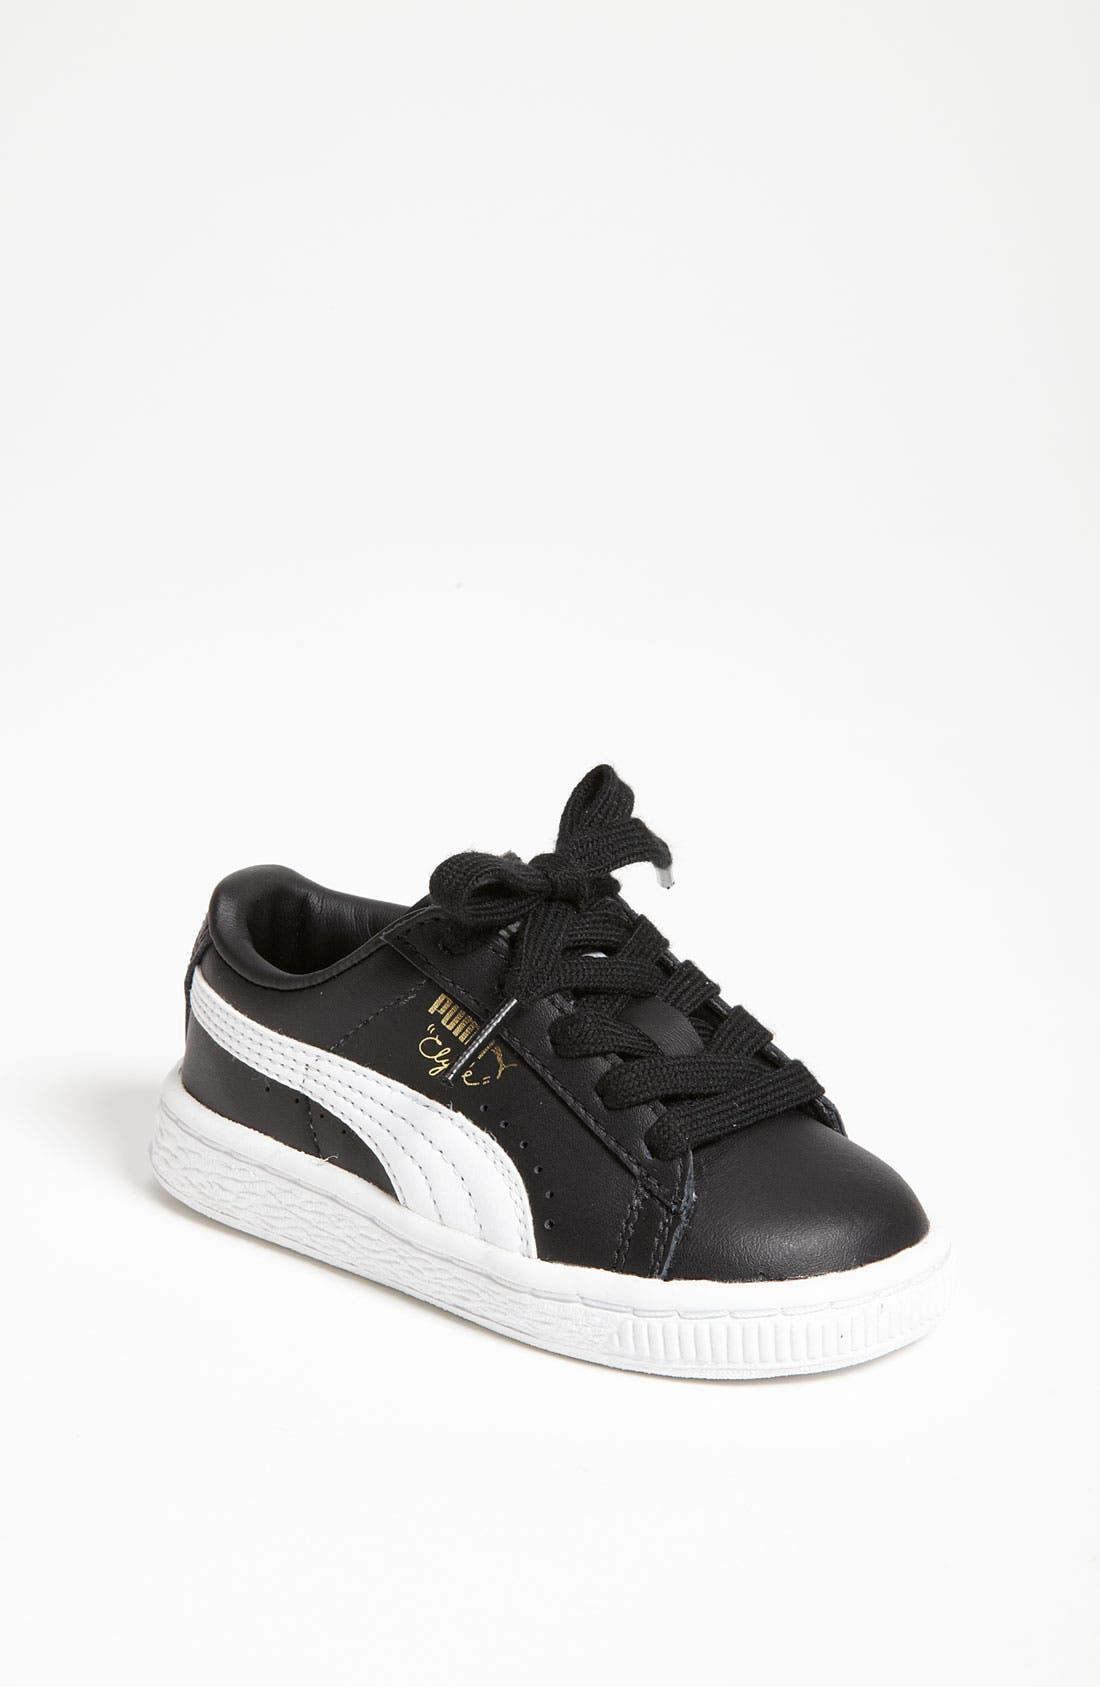 Main Image - PUMA 'Clyde' Sneaker (Baby, Walker & Toddler)